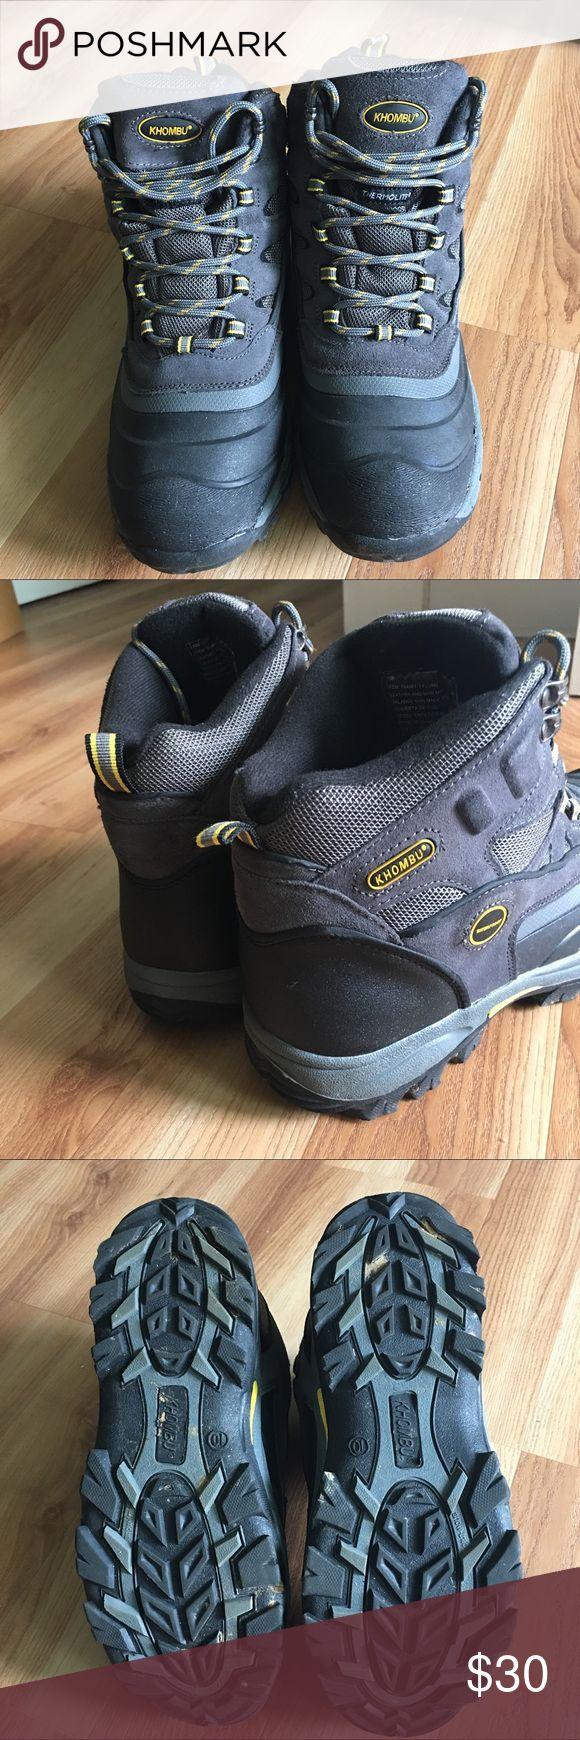 Khombu winter boots, men's size 10 Gray and yellow men's winter boots. Worn once. Waterproof. Khombu Shoes Rain & Snow Boots